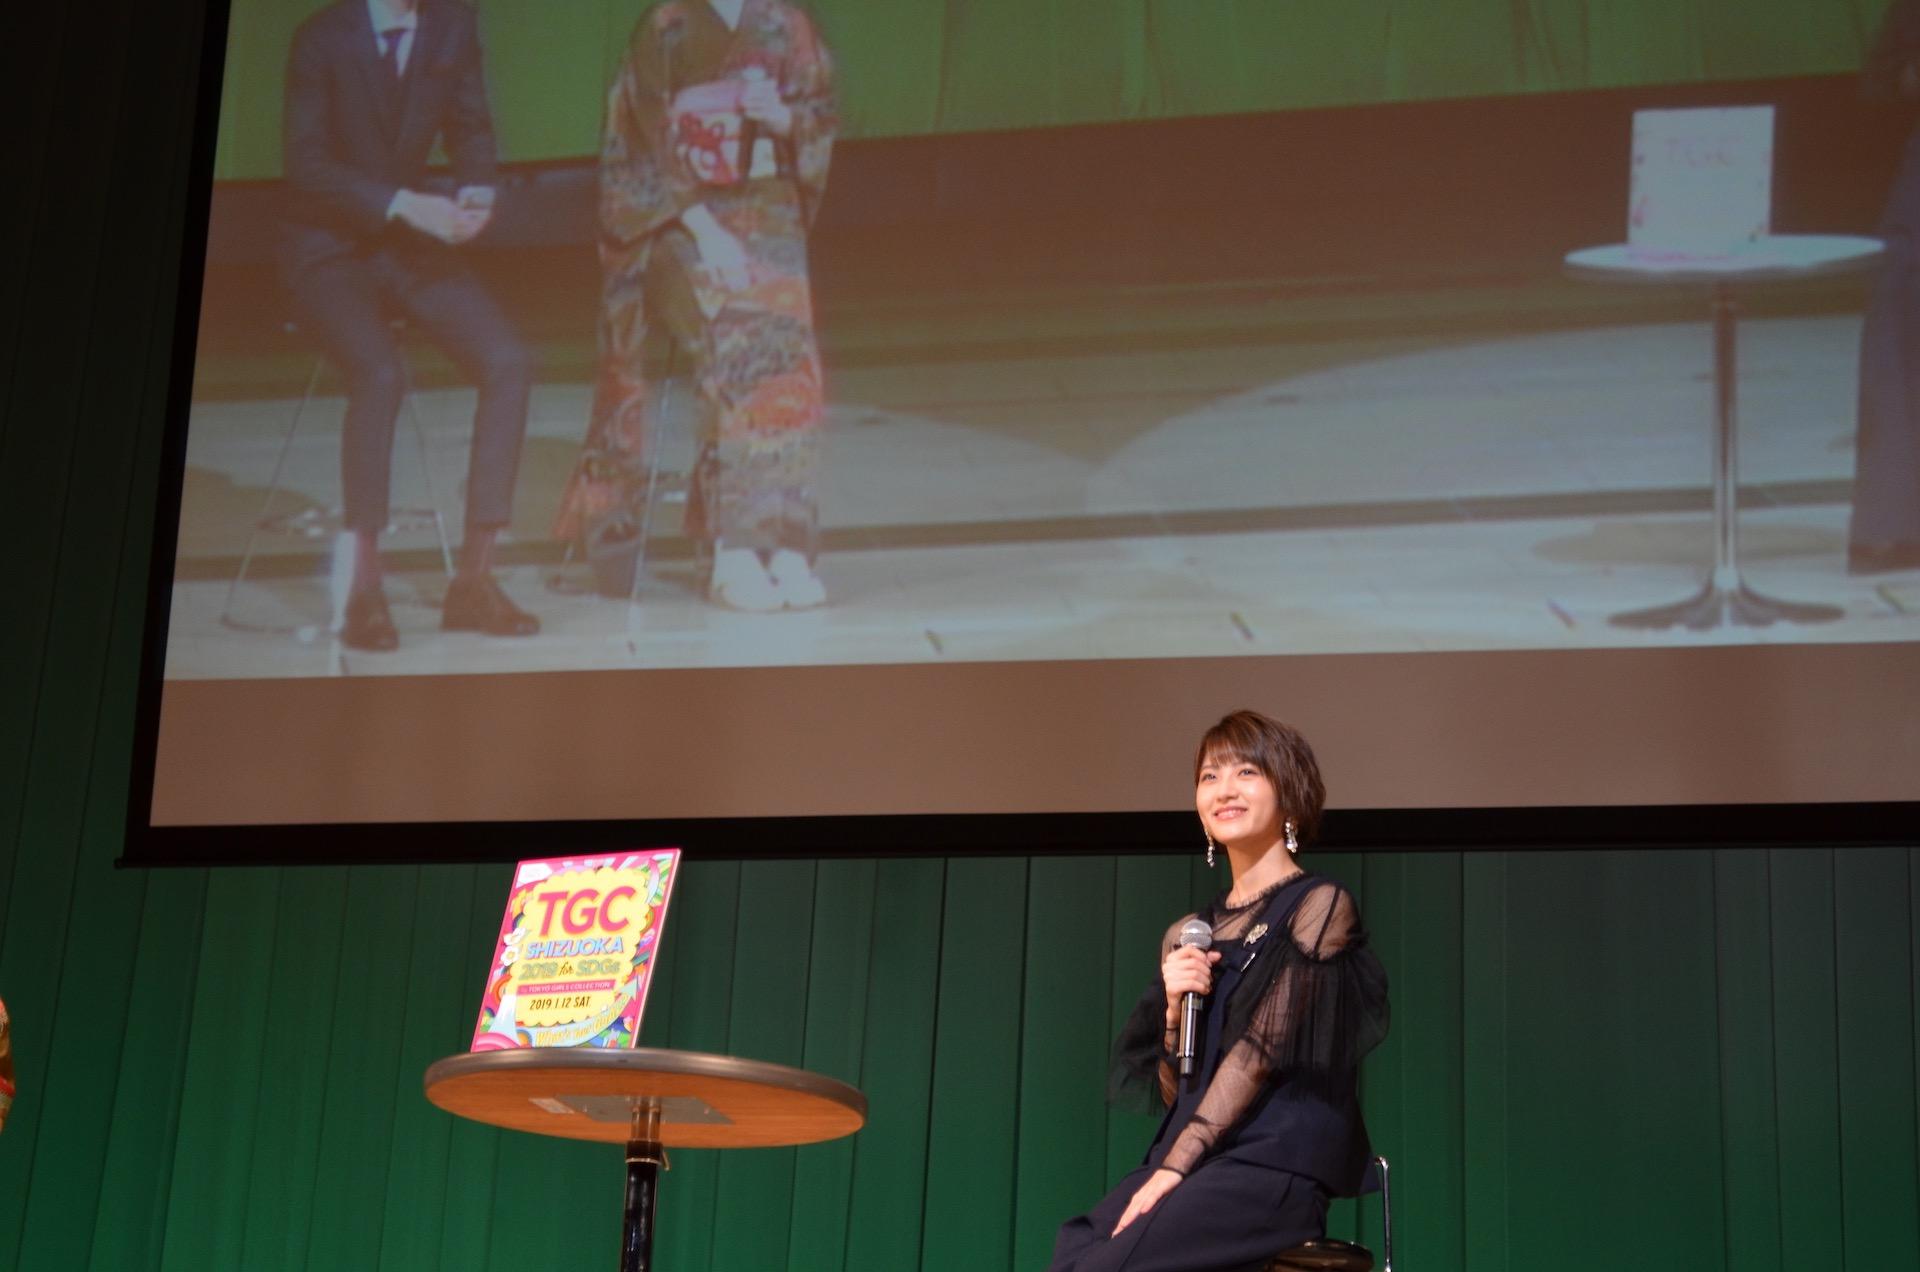 「TGC しずおか 2019」を代表して静岡市成人式に登壇した若月佑美(静岡県富士市出身)